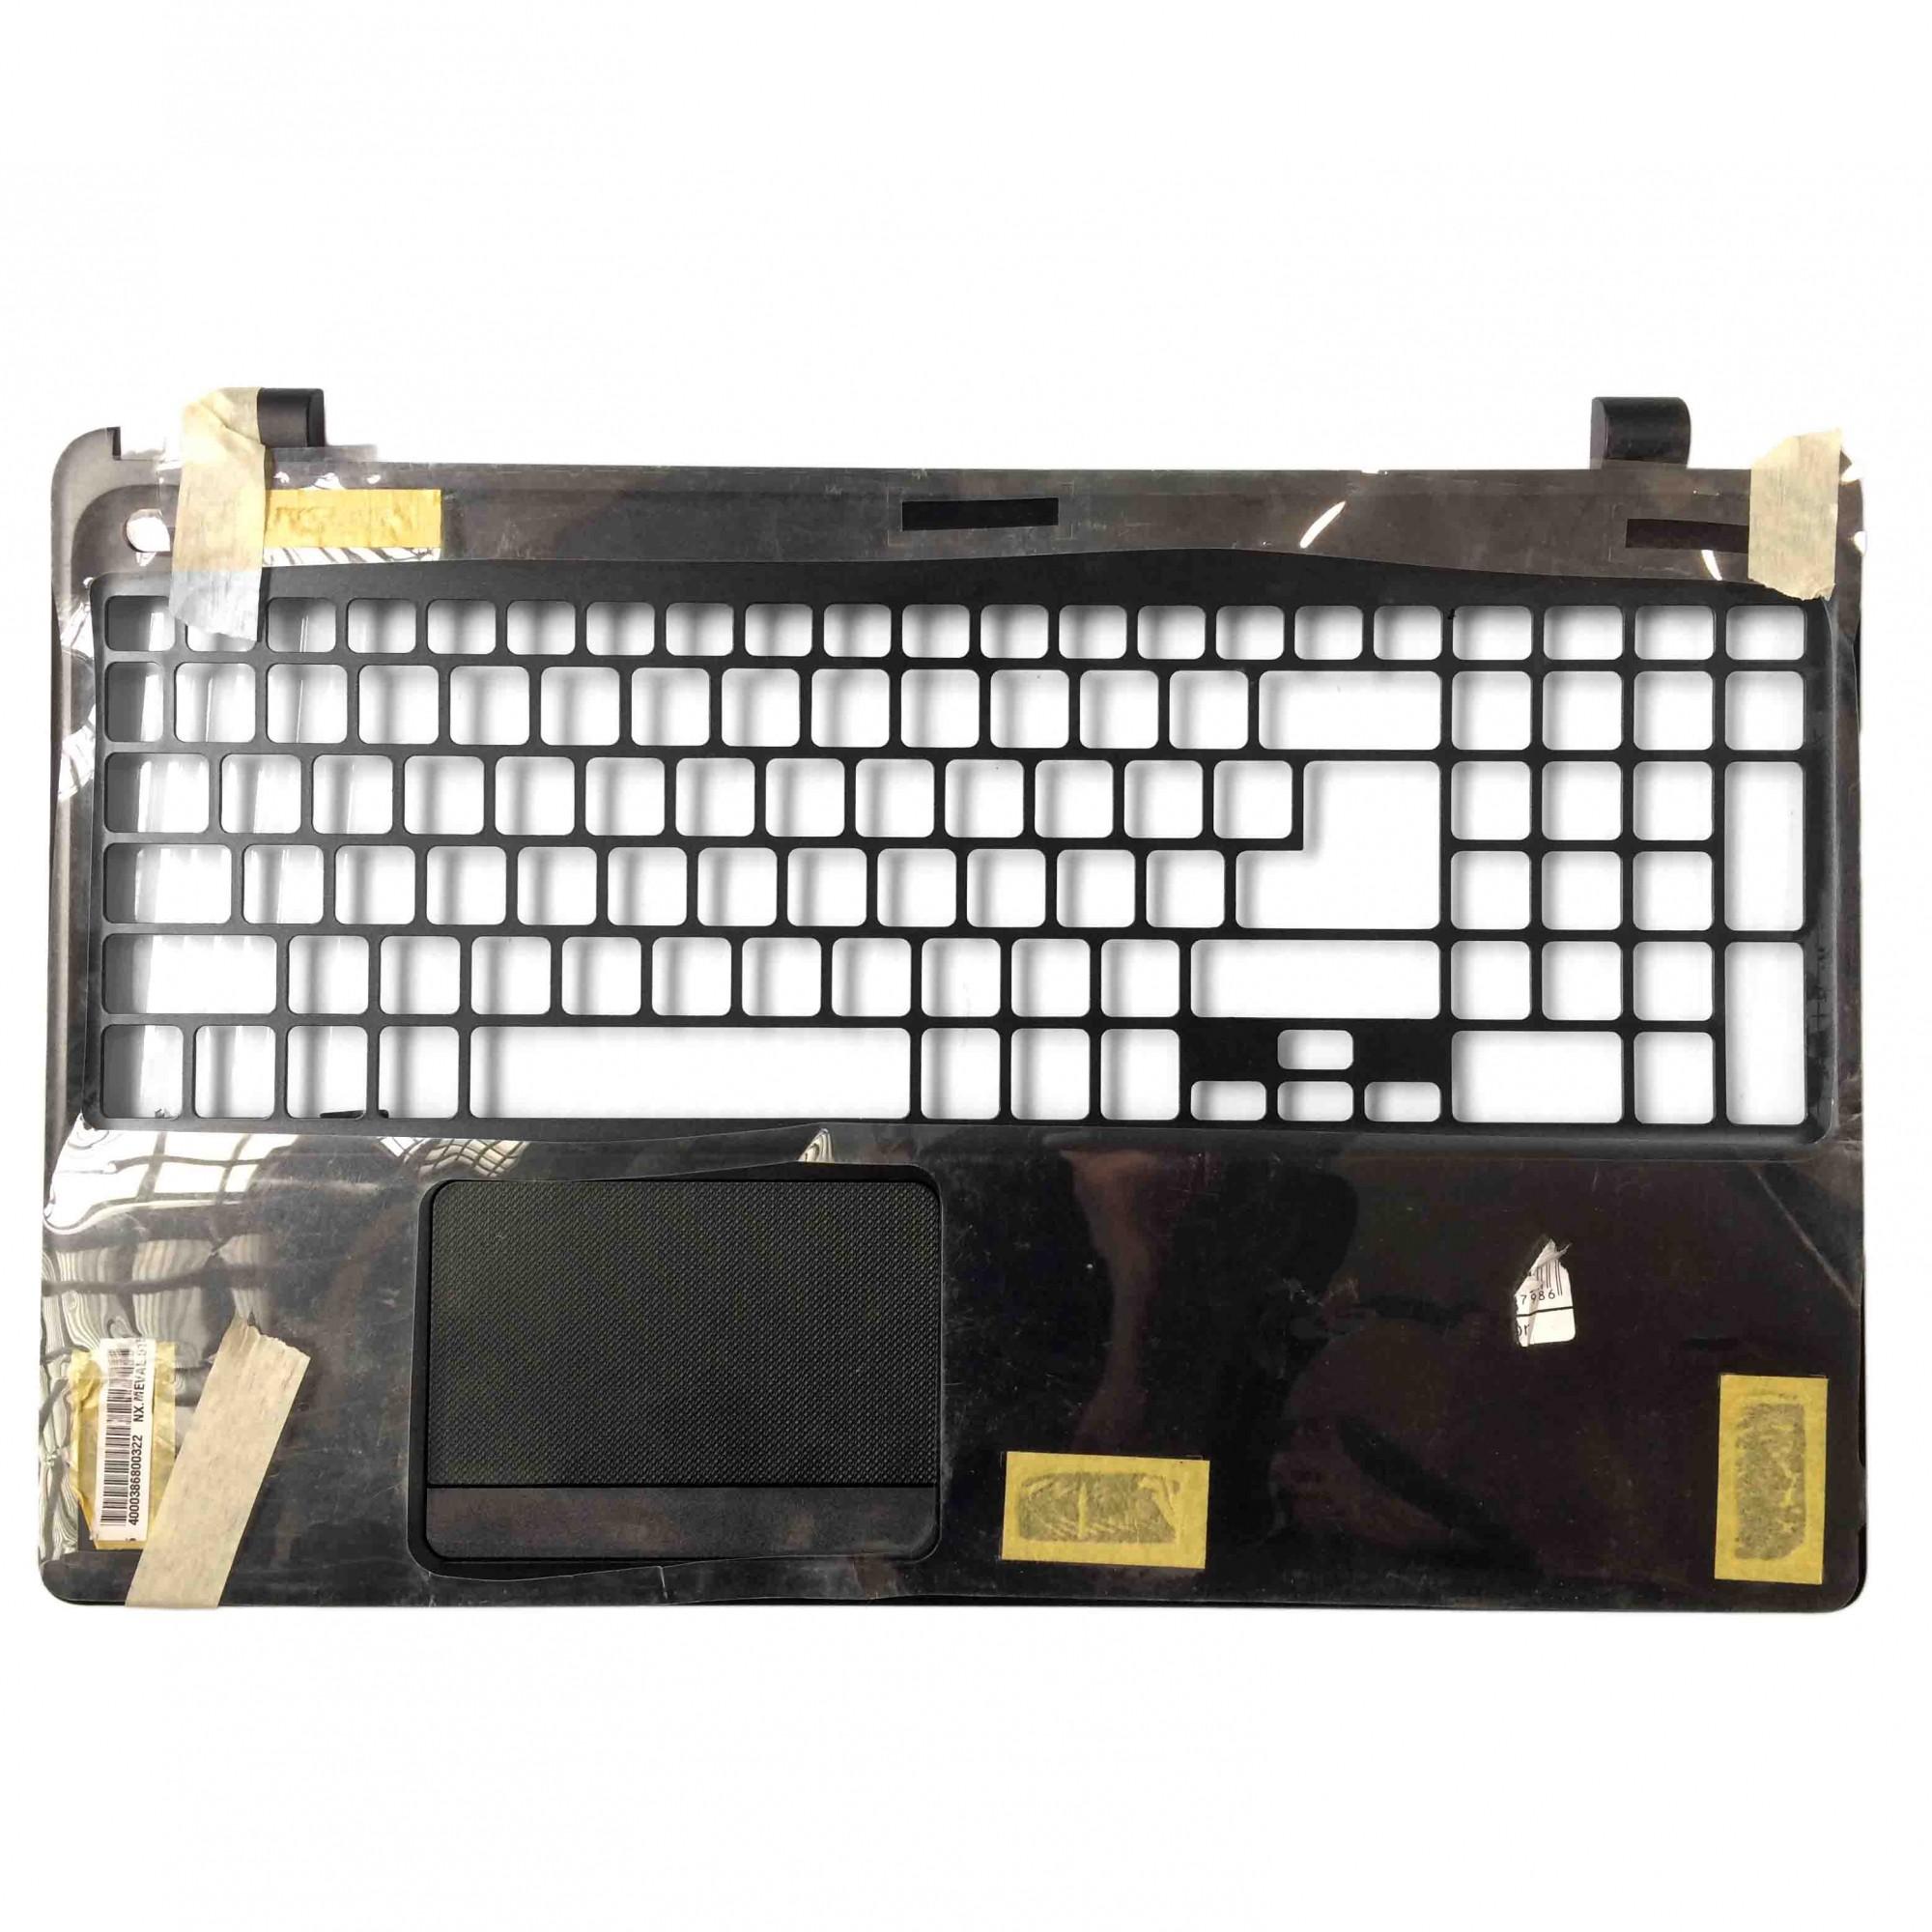 Carcaça Base Superior + TouchPad + Cabo Flat Notebook Acer Aspire E1-572 E1-510 PN:Ap0vr0007 - NOVO